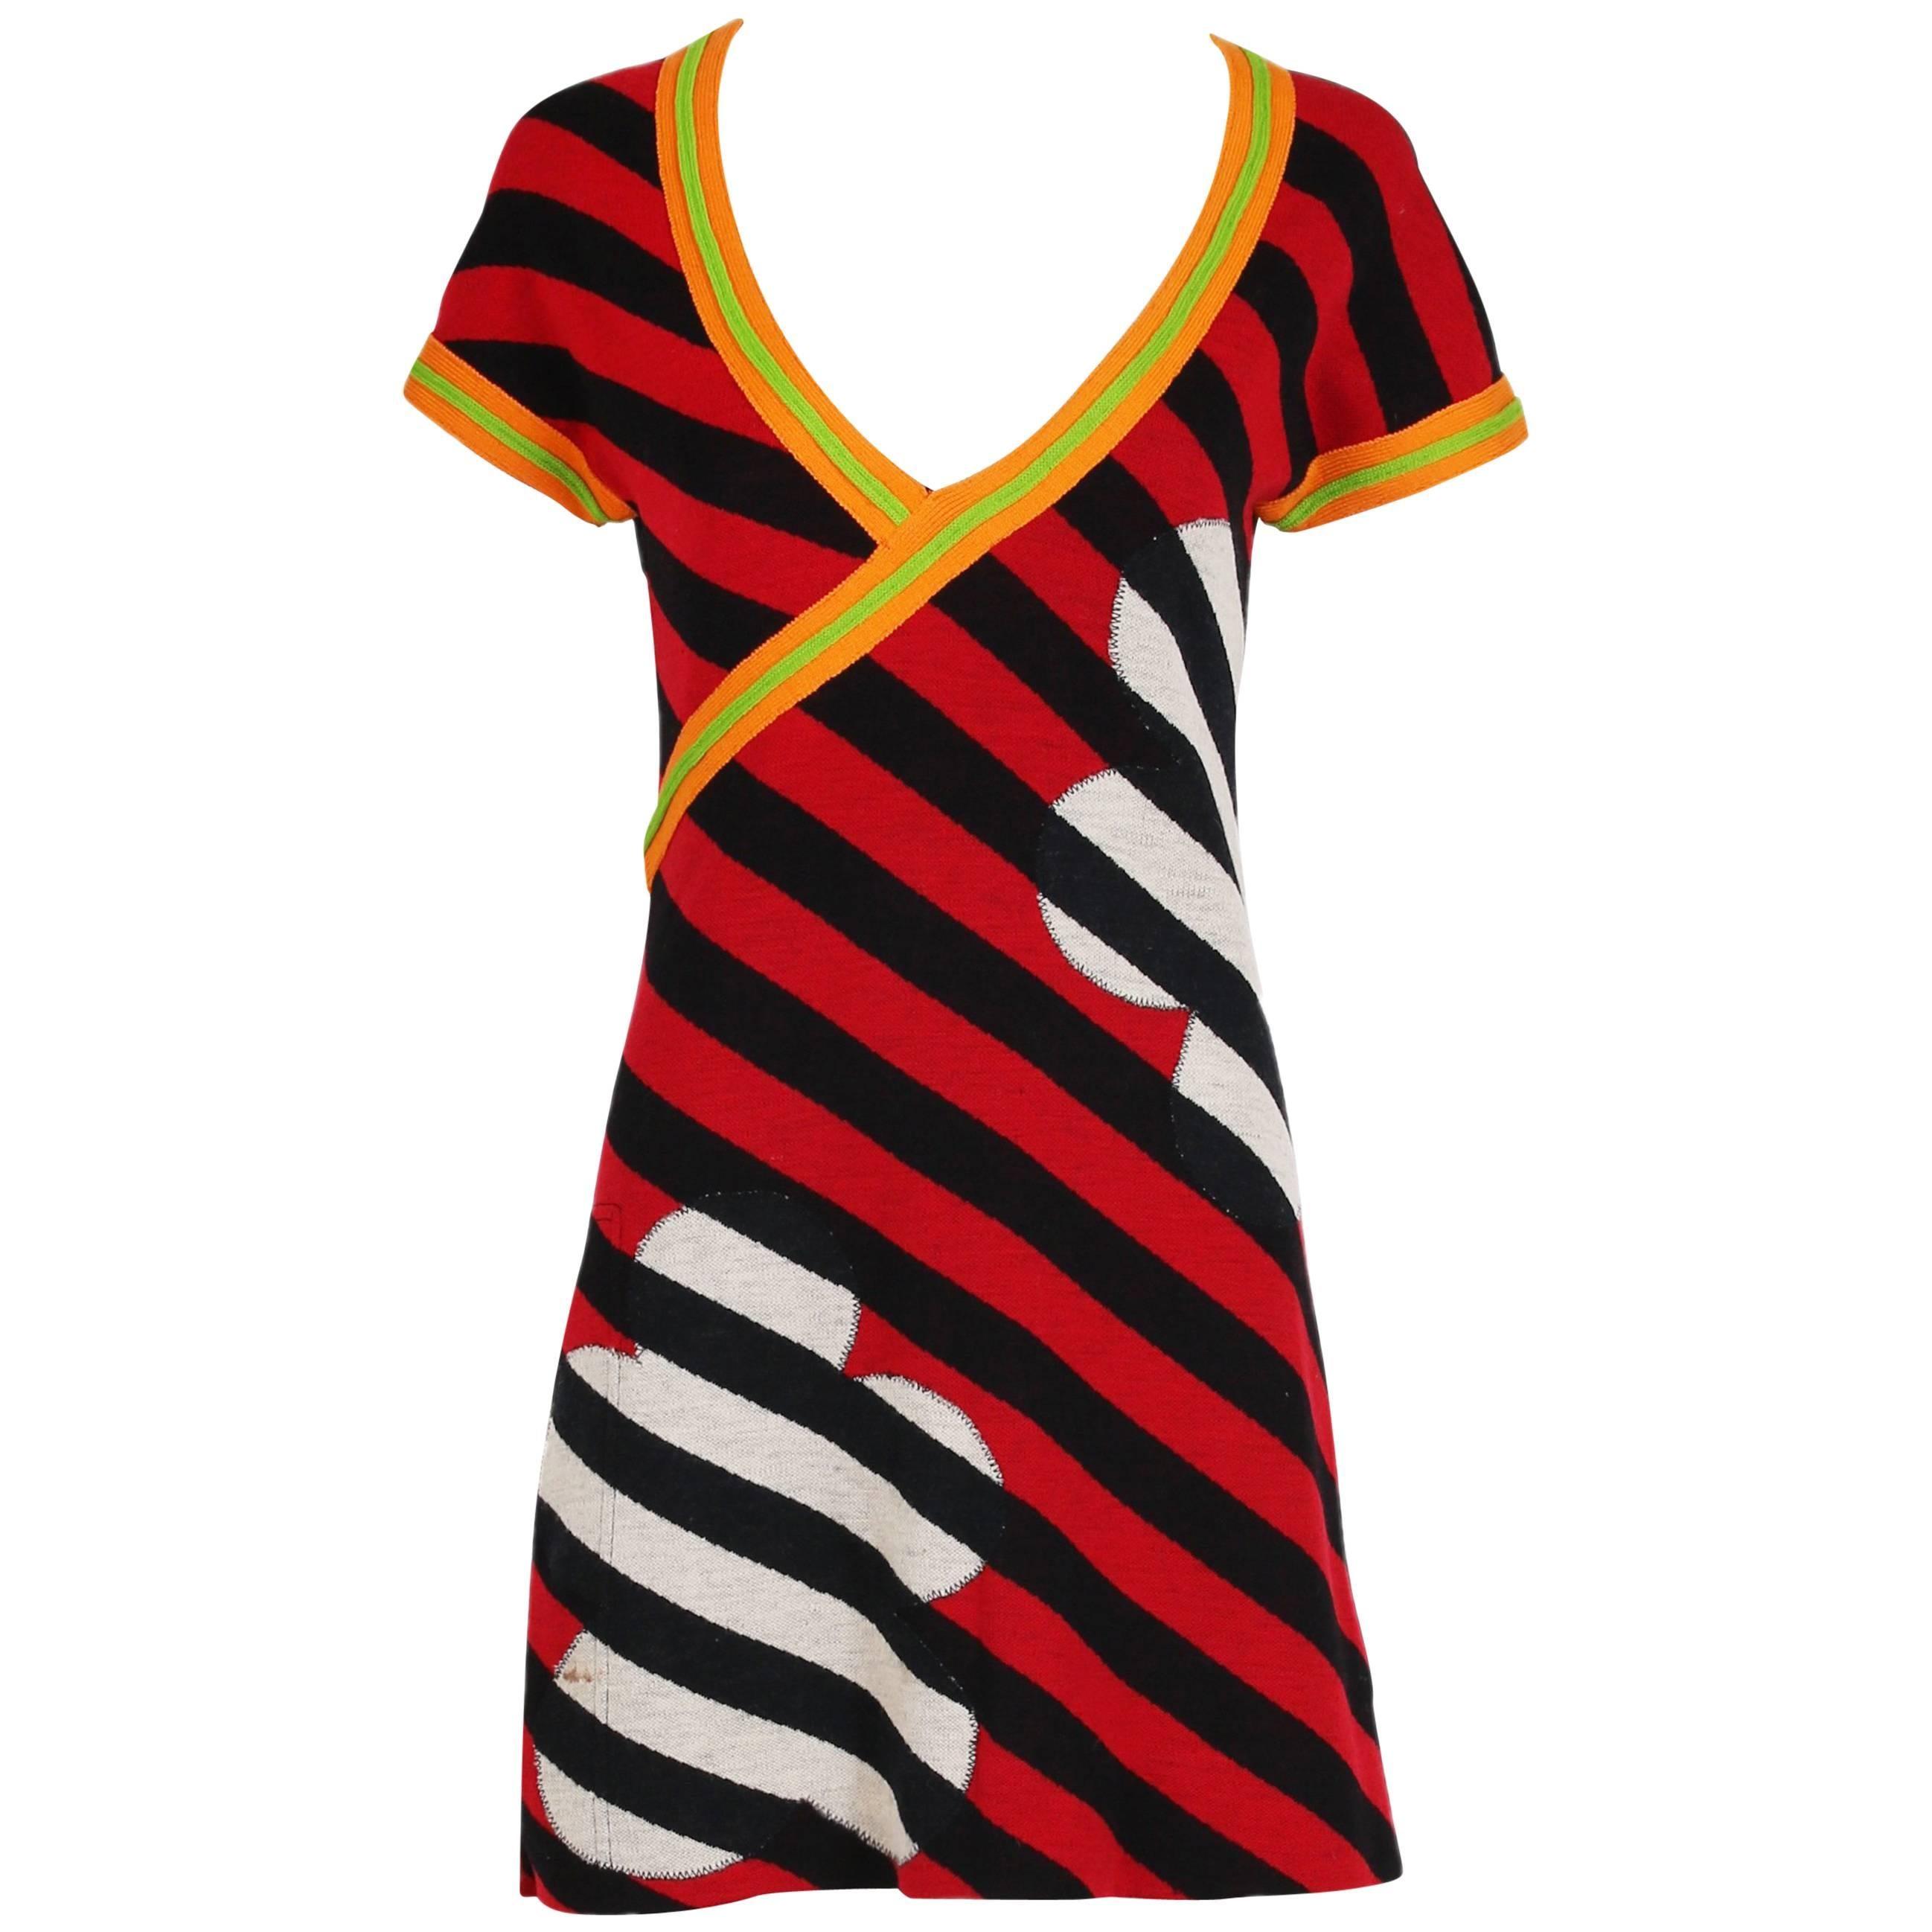 076ab8d1f62 Vintage Marimekko Pink and Orange Cotton Abstract Print Maxi Dress at  1stdibs